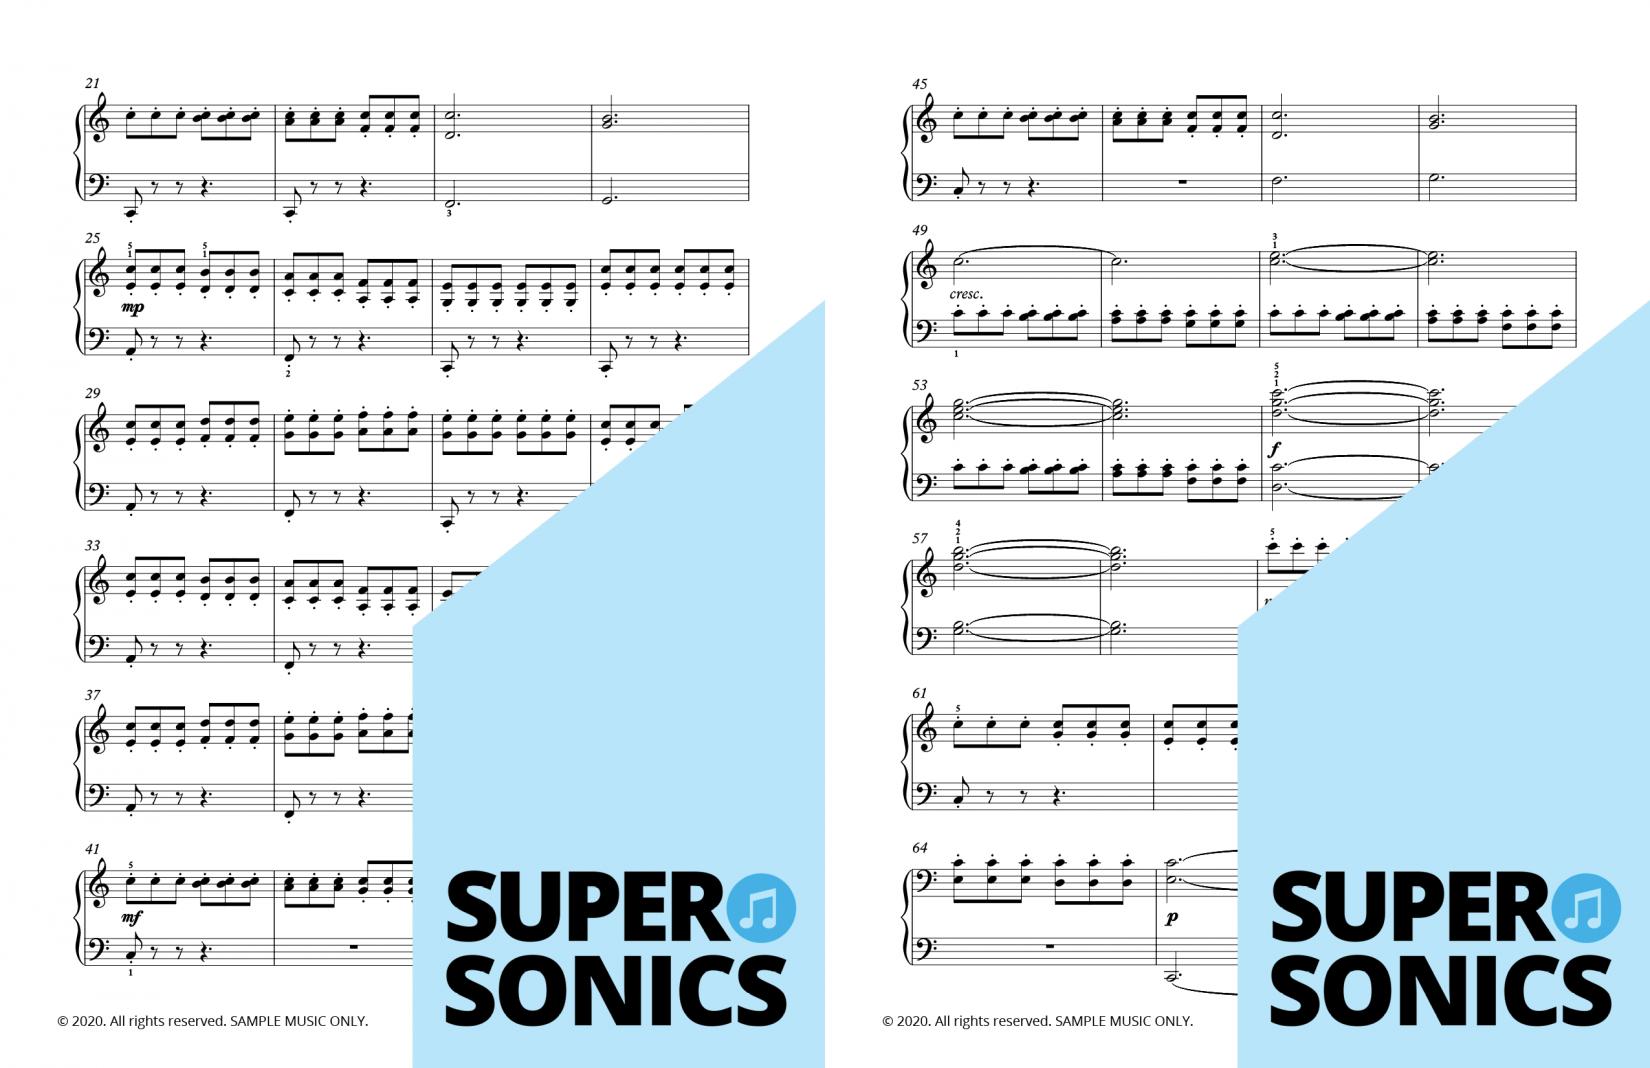 Supersonics Piano Key Explorer sample